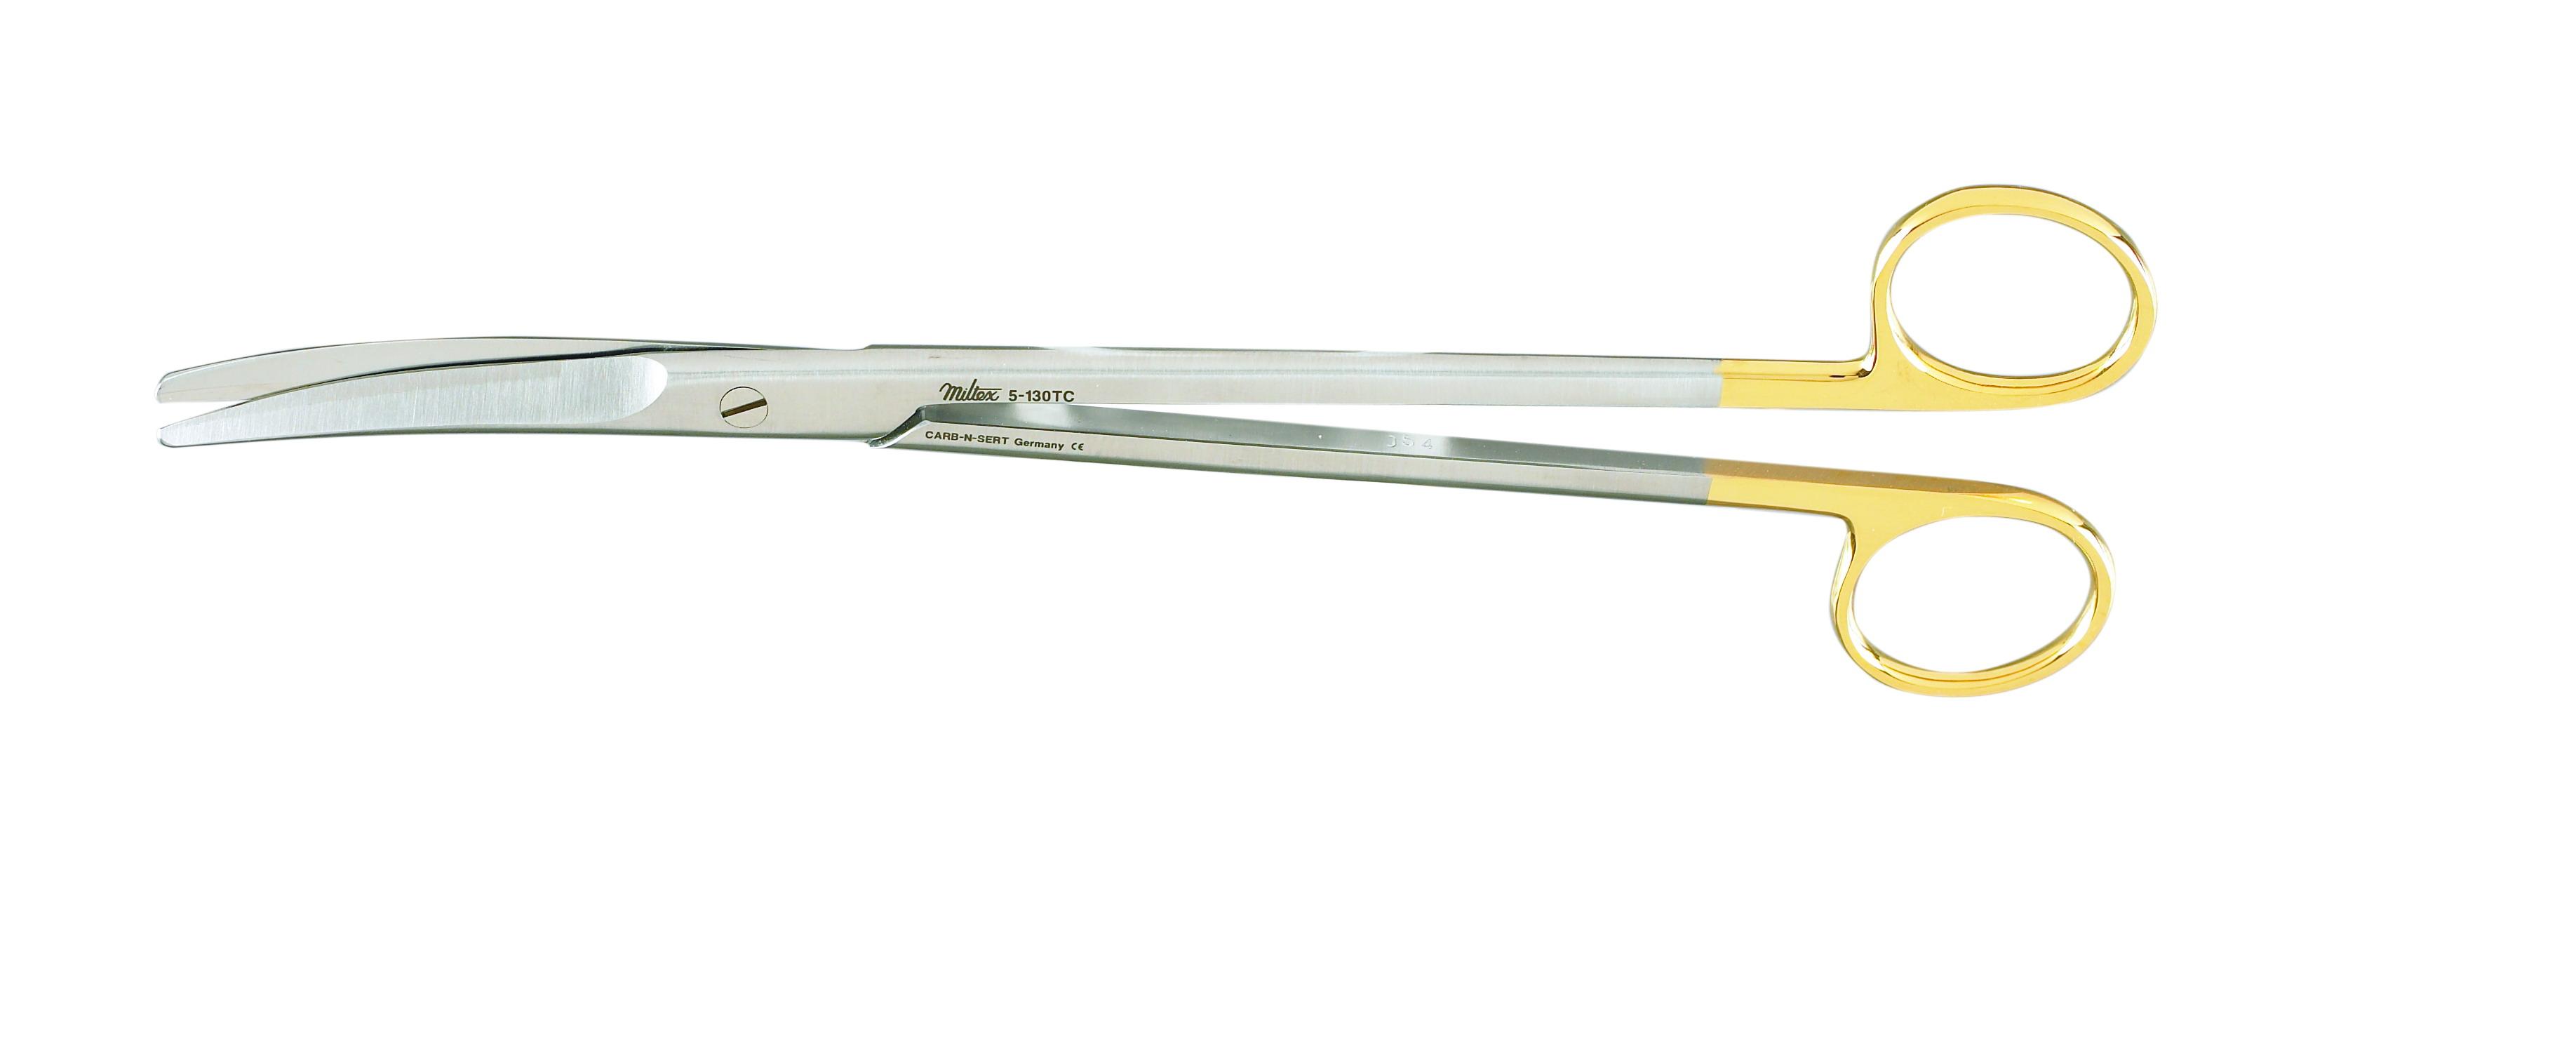 mayo-dissecting-scissors-9-229-cm-curved-standard-bevele-blades-5-130tc-miltex.jpg